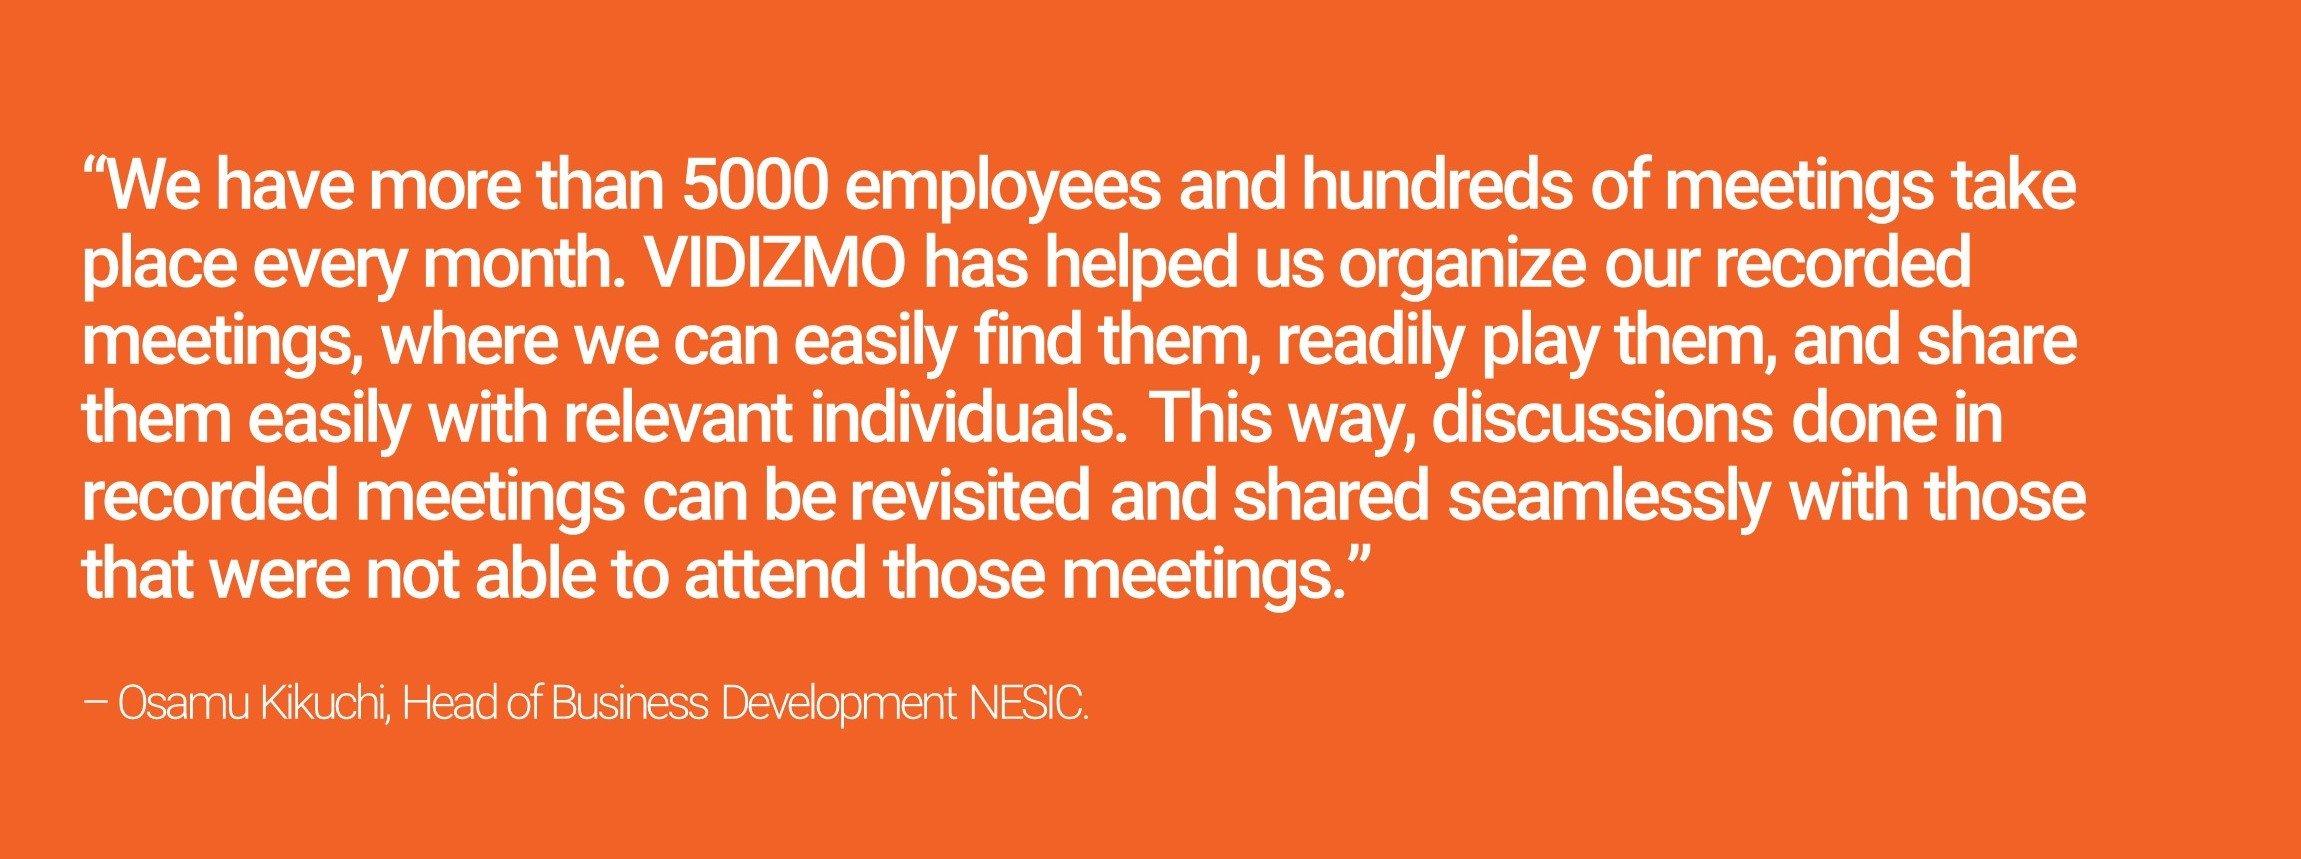 Quote by NEC on VIDIZMO Video Platform